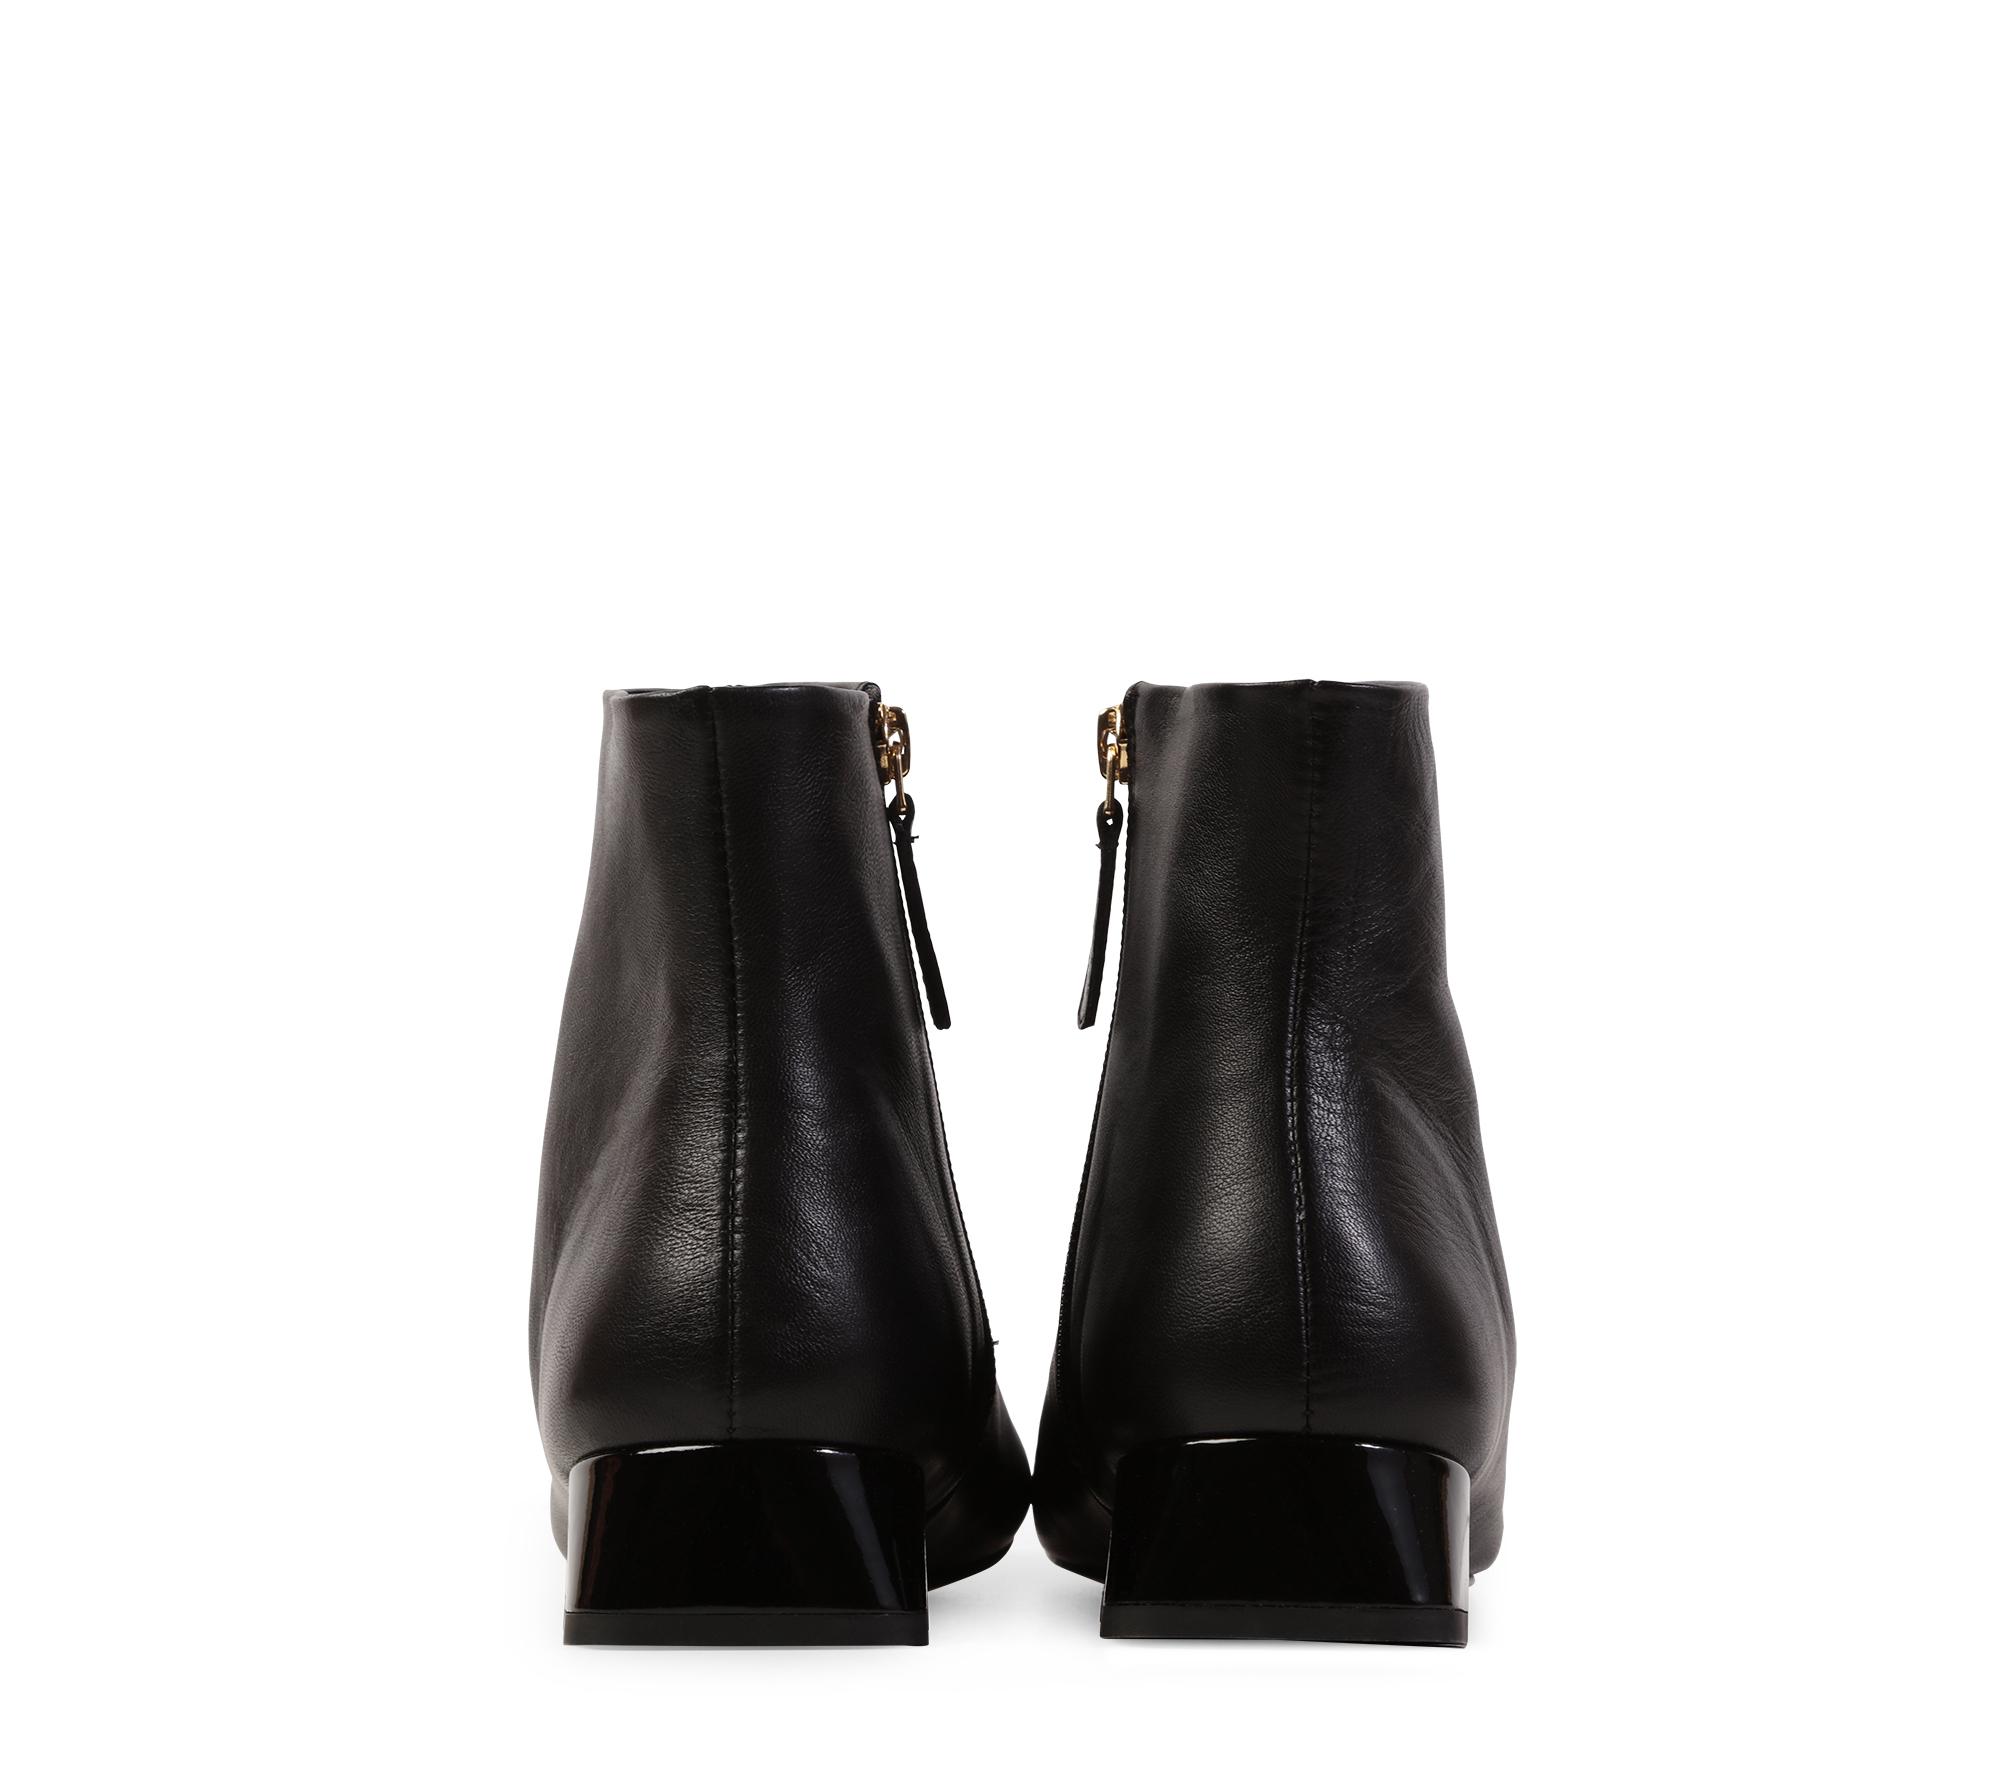 Maxou boots